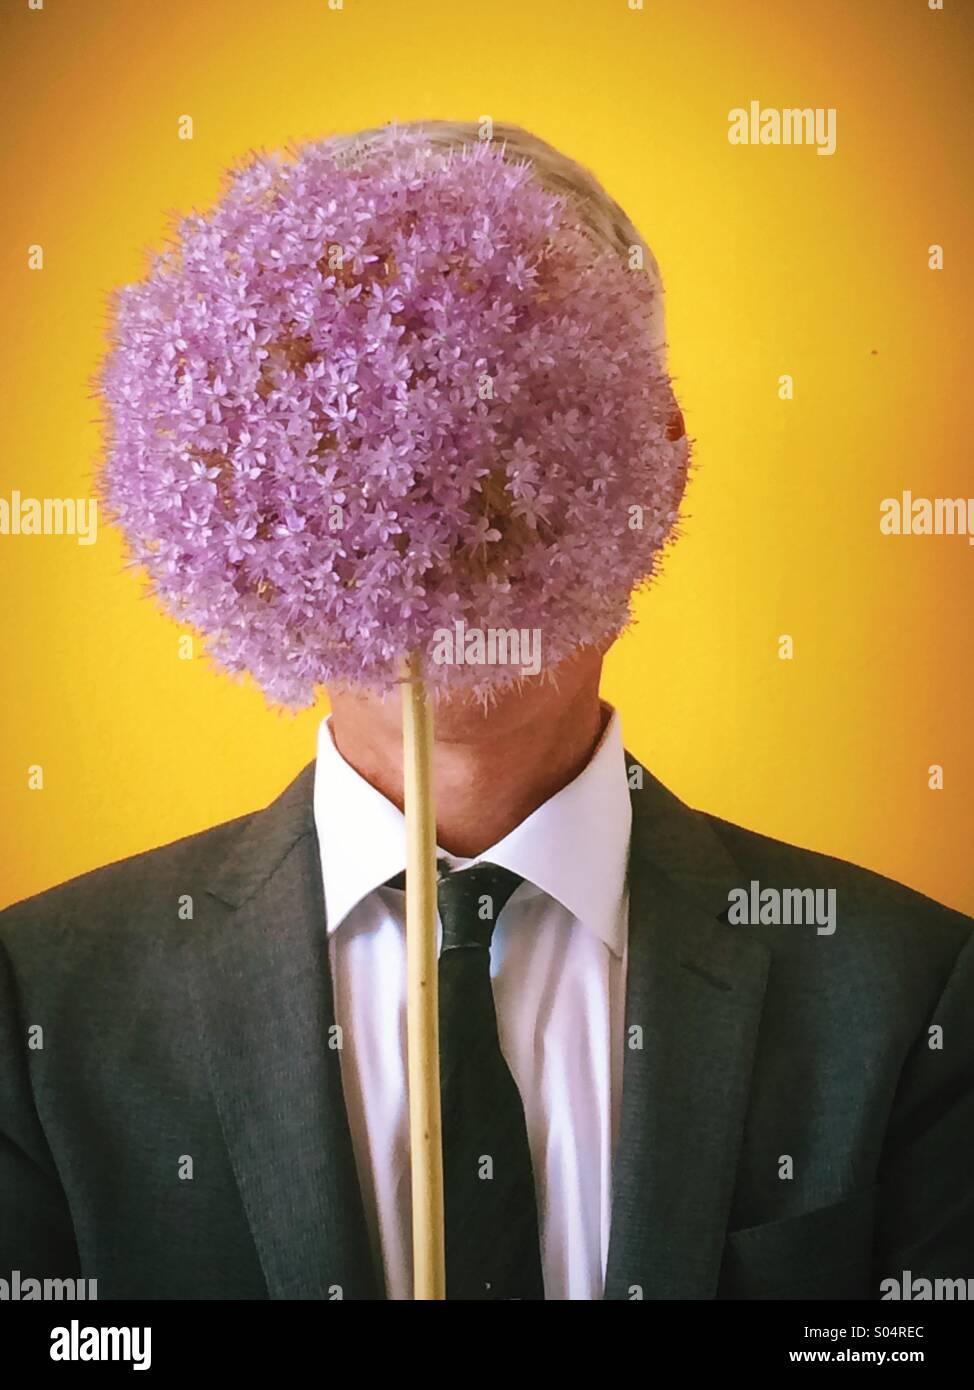 Alium Blume Häute mans Gesicht Stockbild